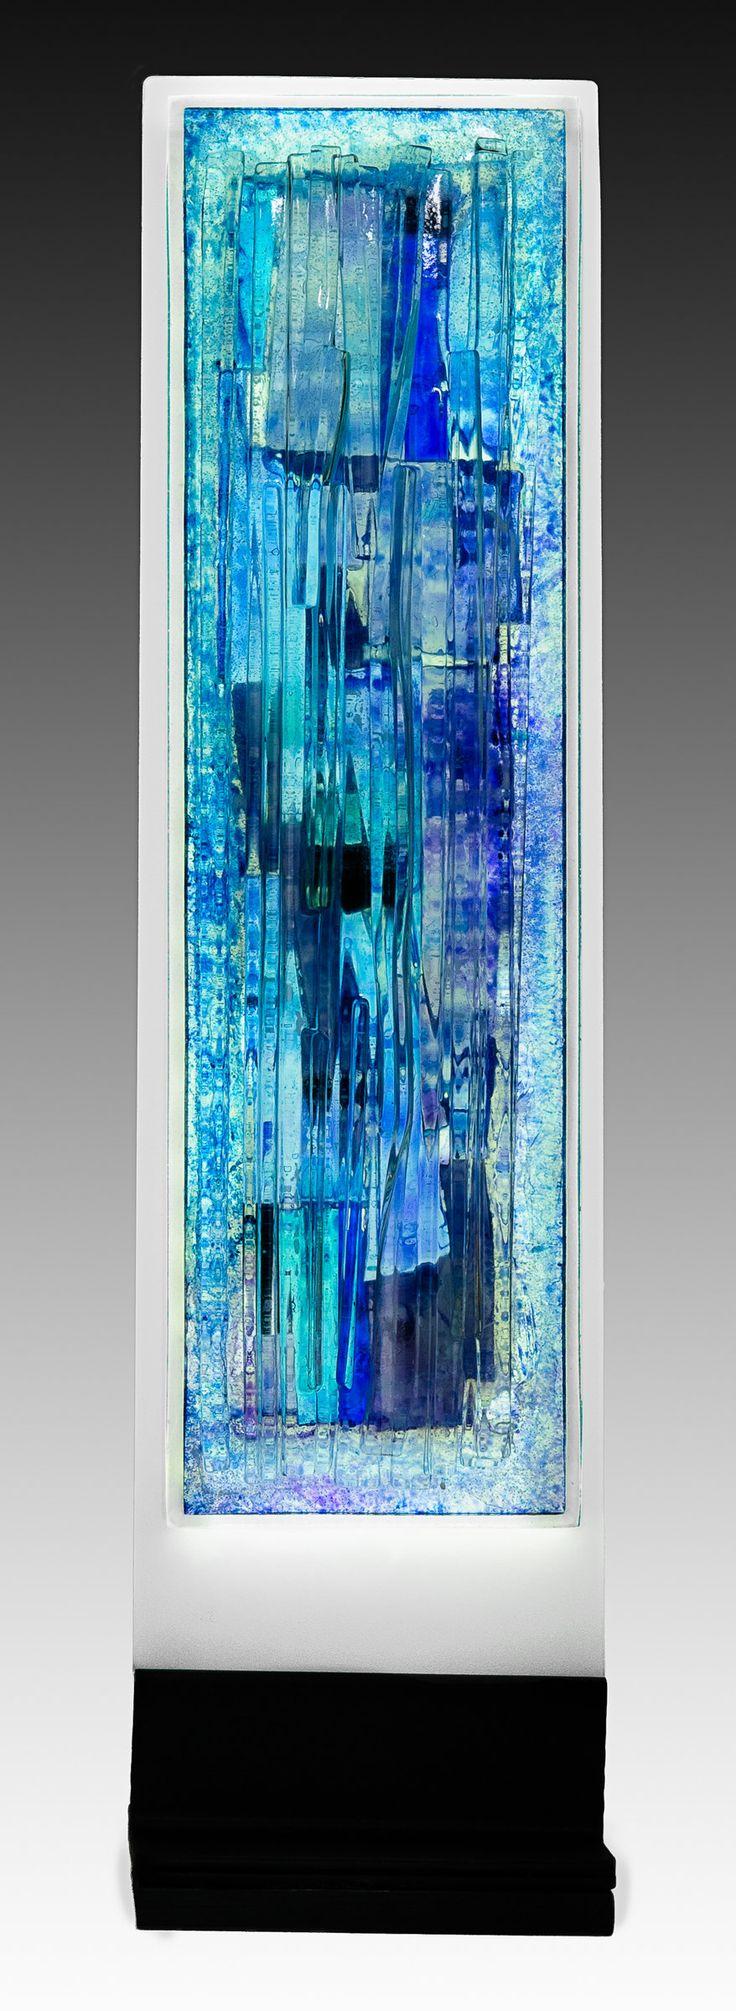 Indigo by Alicia Kelemen (Art Glass Sculpture) | Artful Home